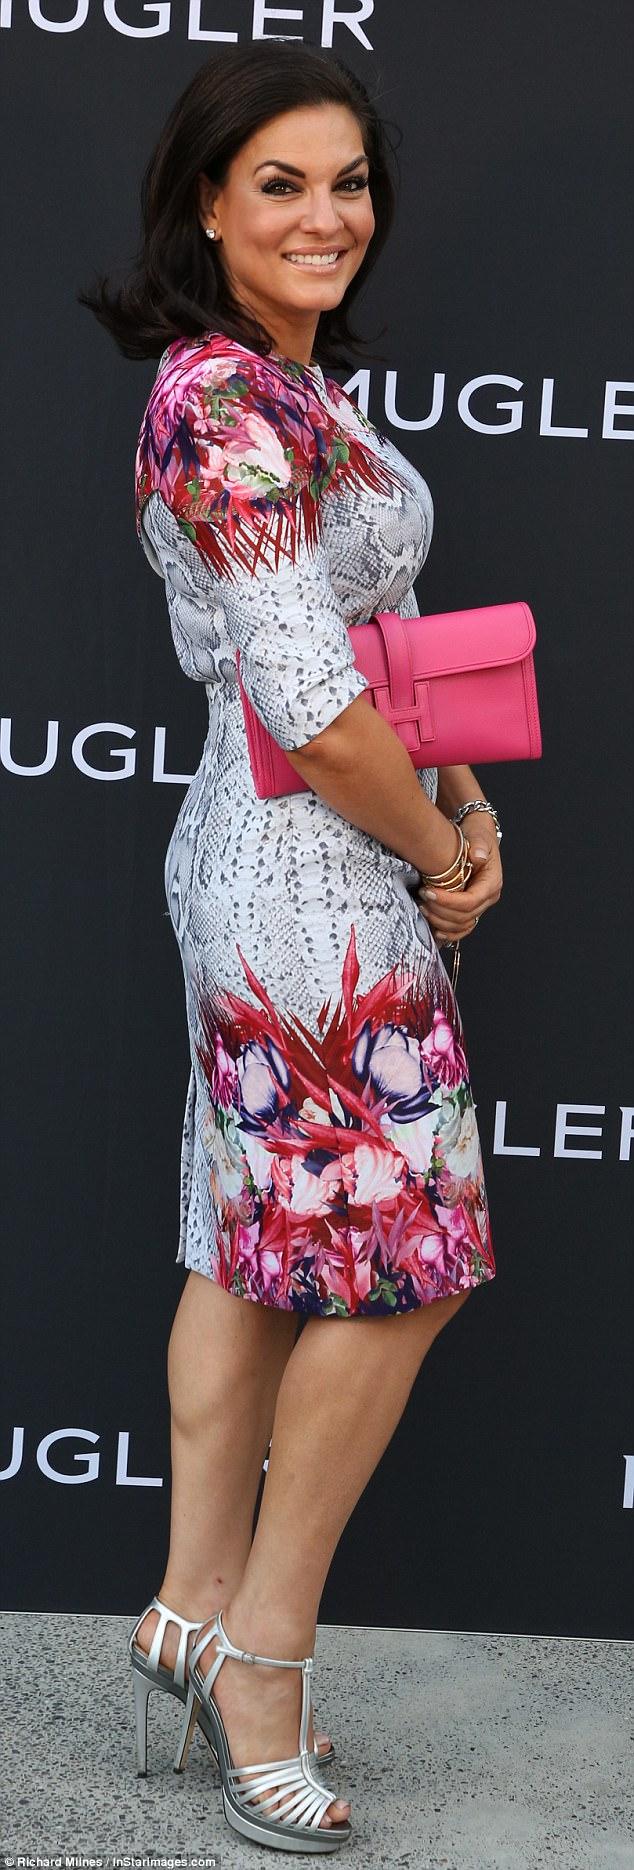 Nicole O'Neil at the Mugler Fragrance Launch -.jpg